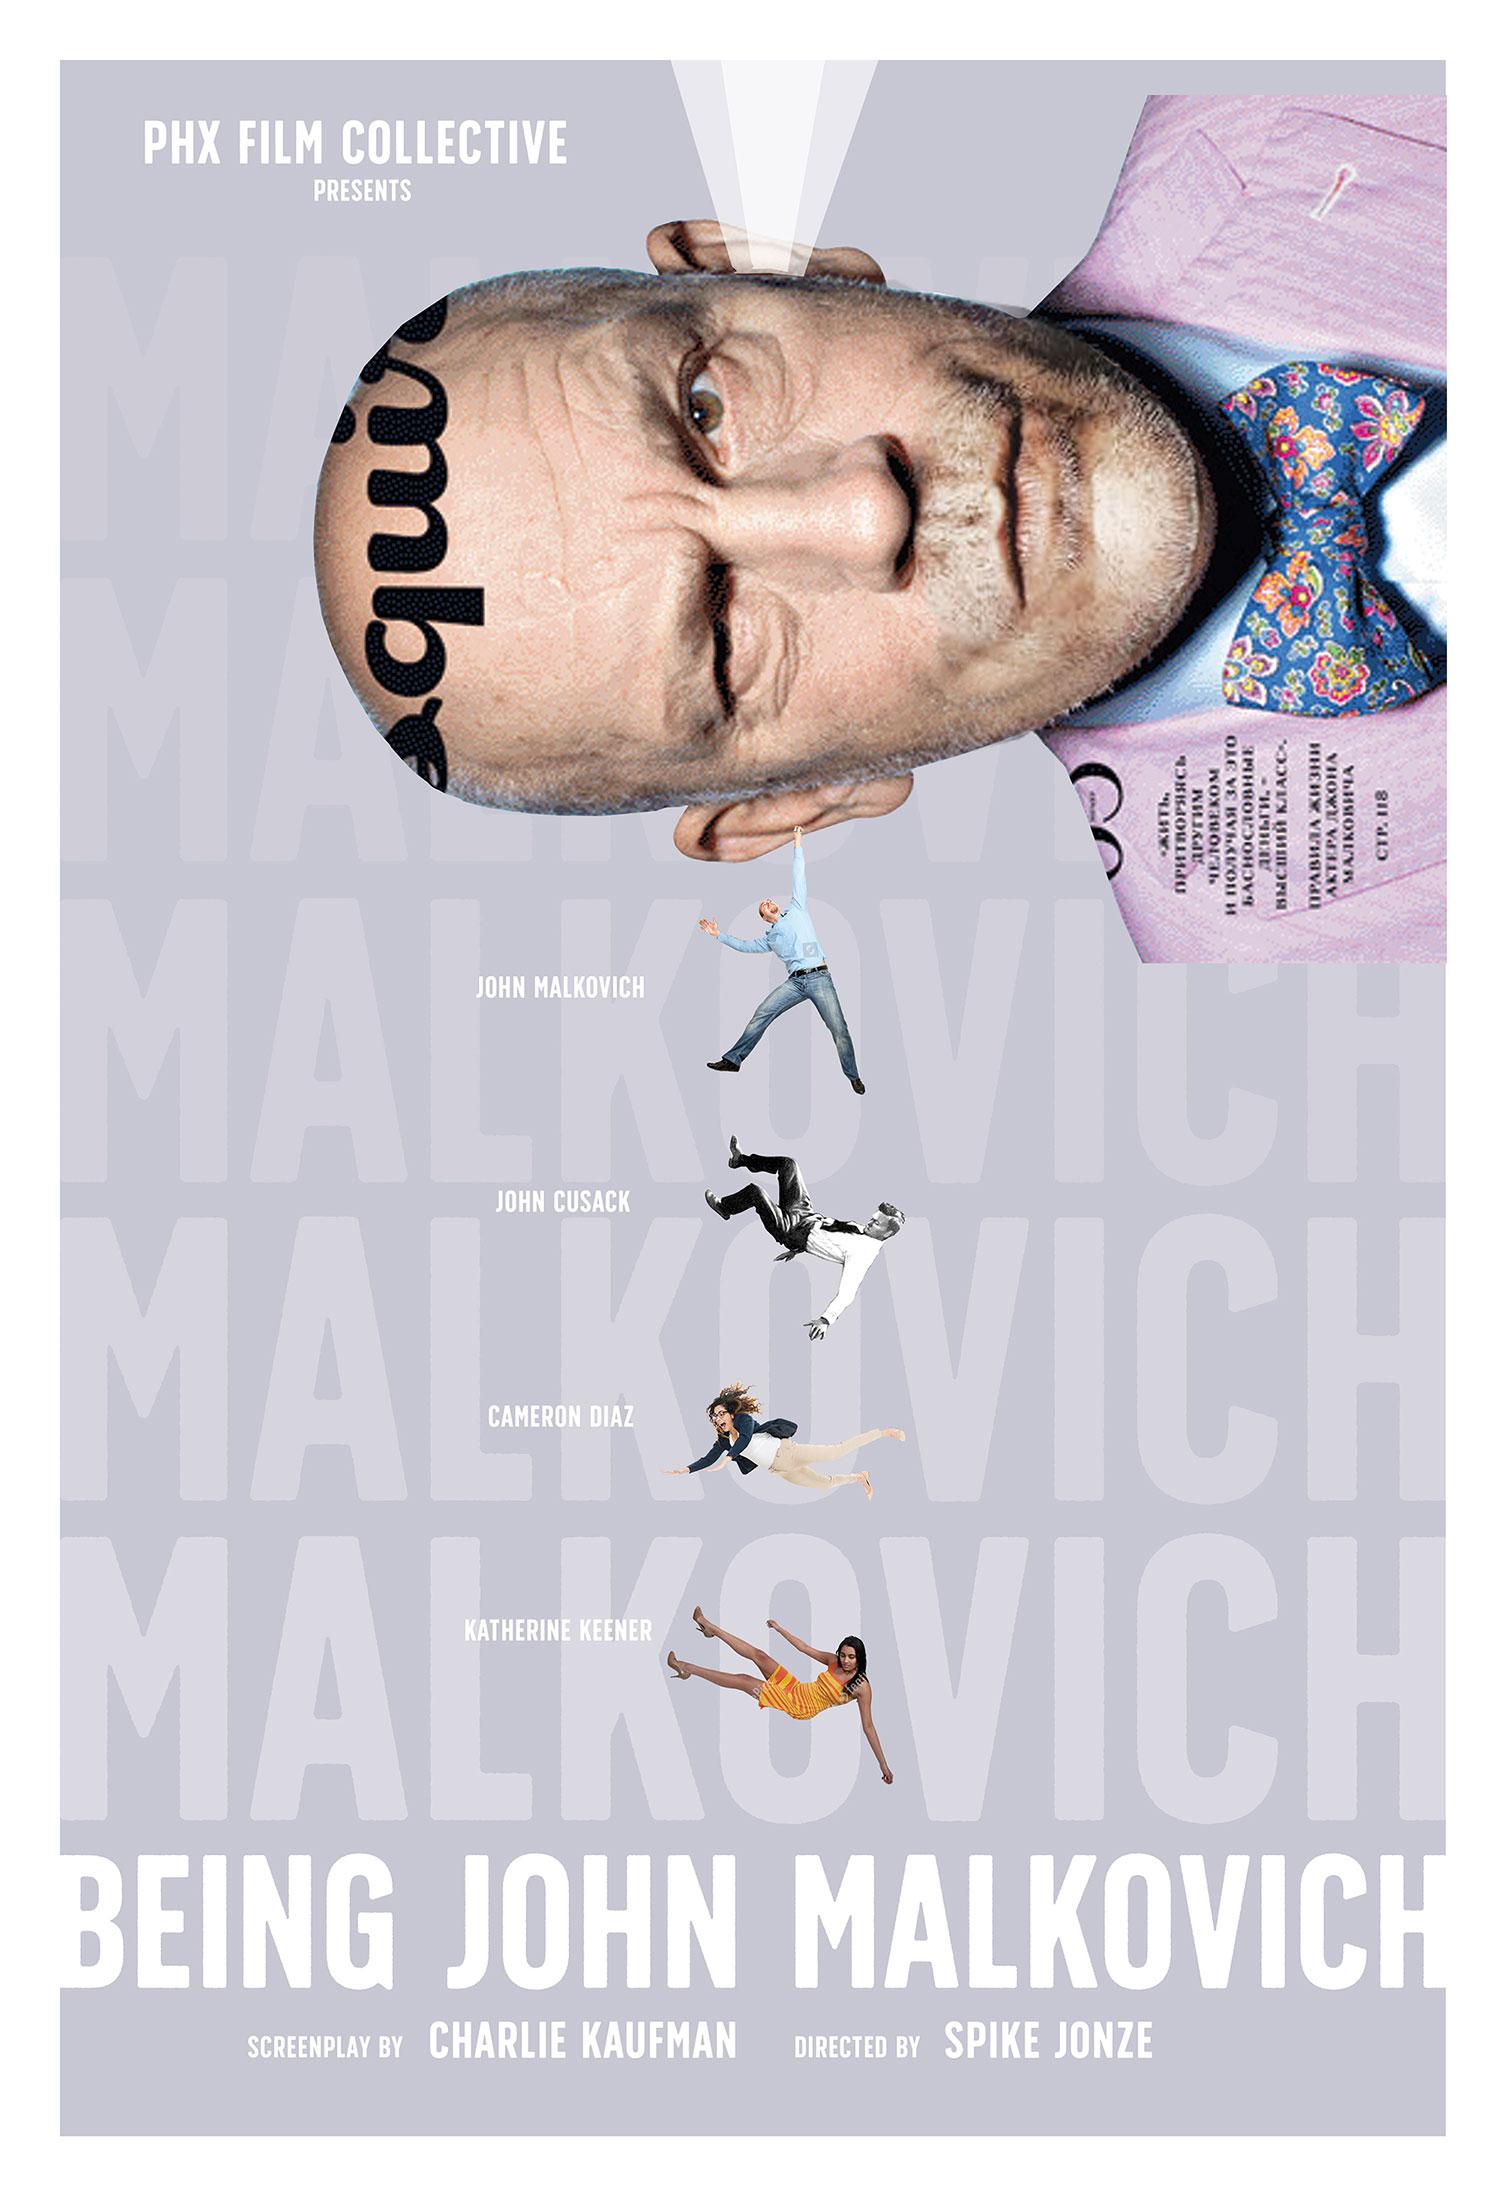 Being-John-Malkovich-poster-reference-1.jpg